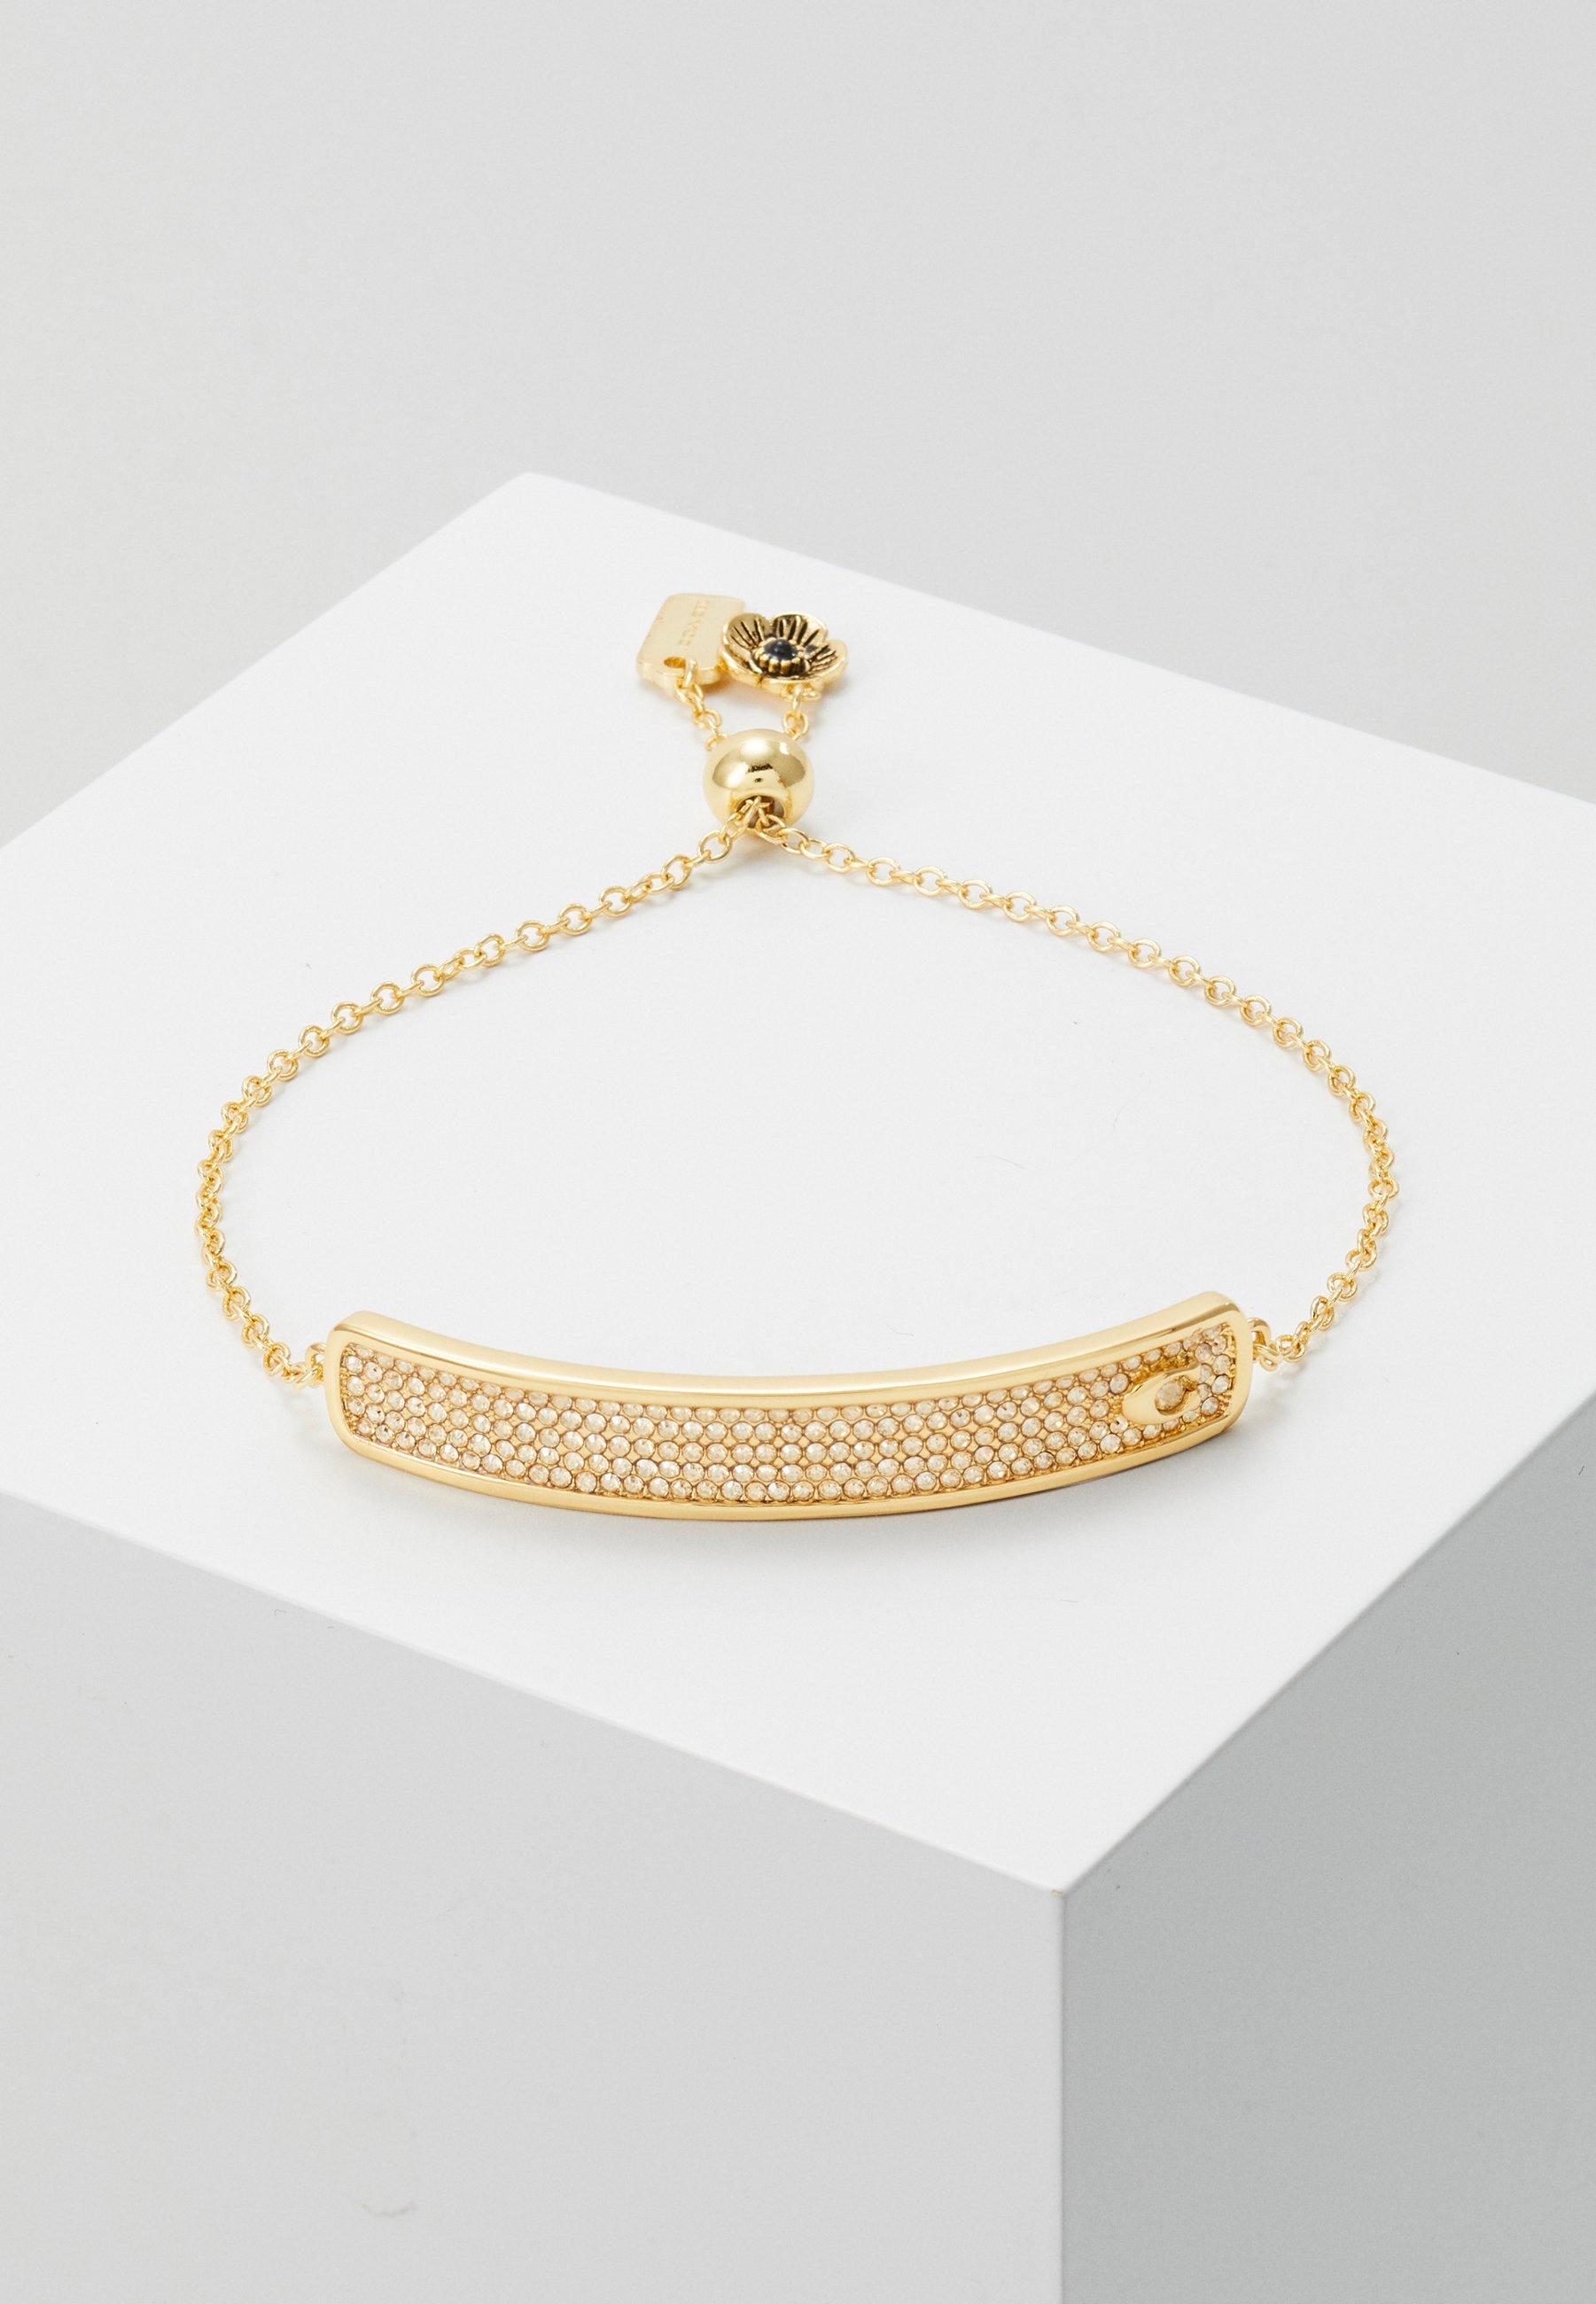 Coach Pave Slider Bracelet - Armband Gold-coloured/gold